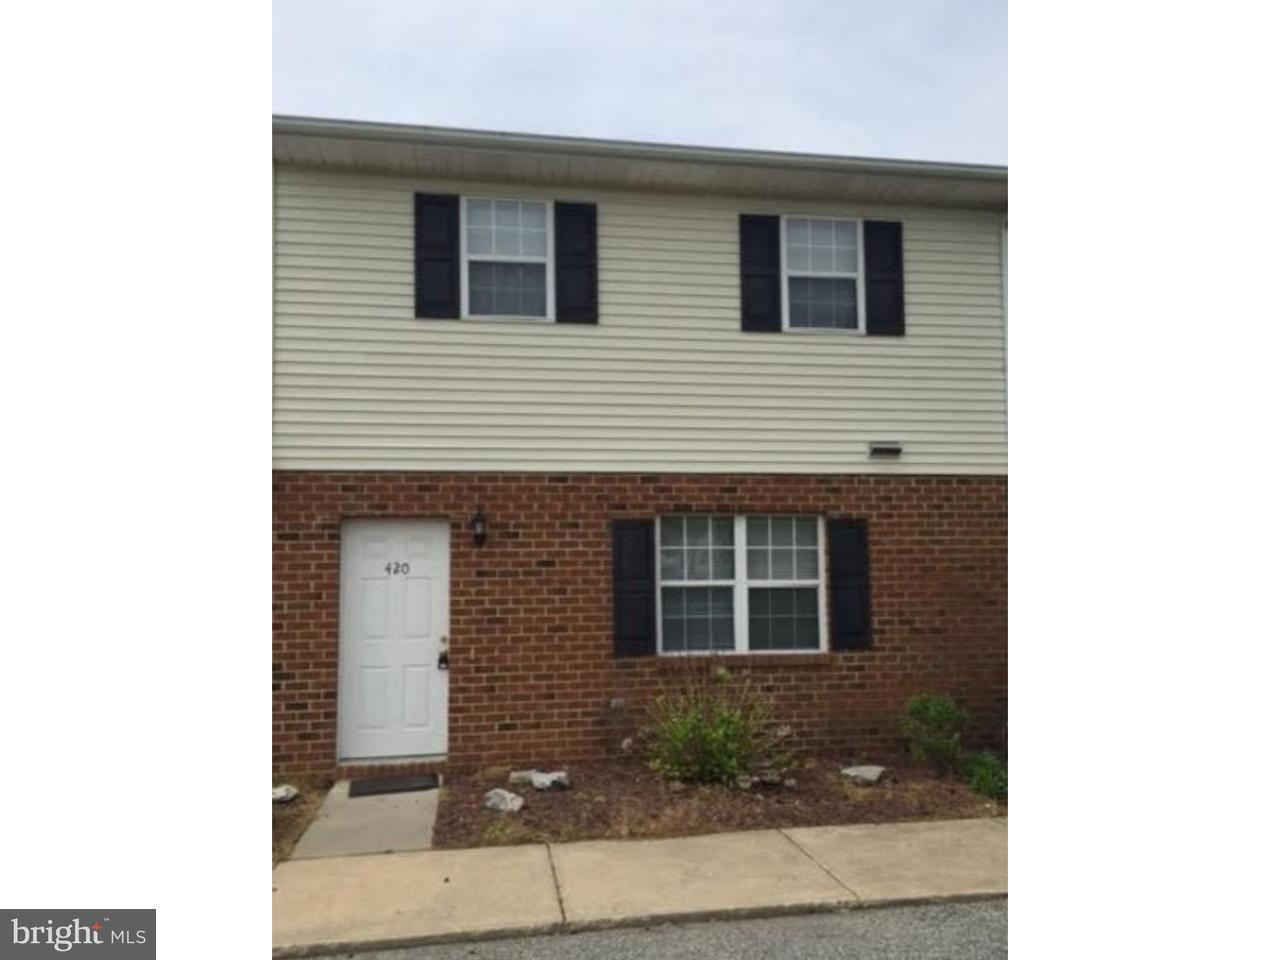 Townhouse for Rent at 432 SMYRNA CLAYTON BLVD Smyrna, Delaware 19977 United States